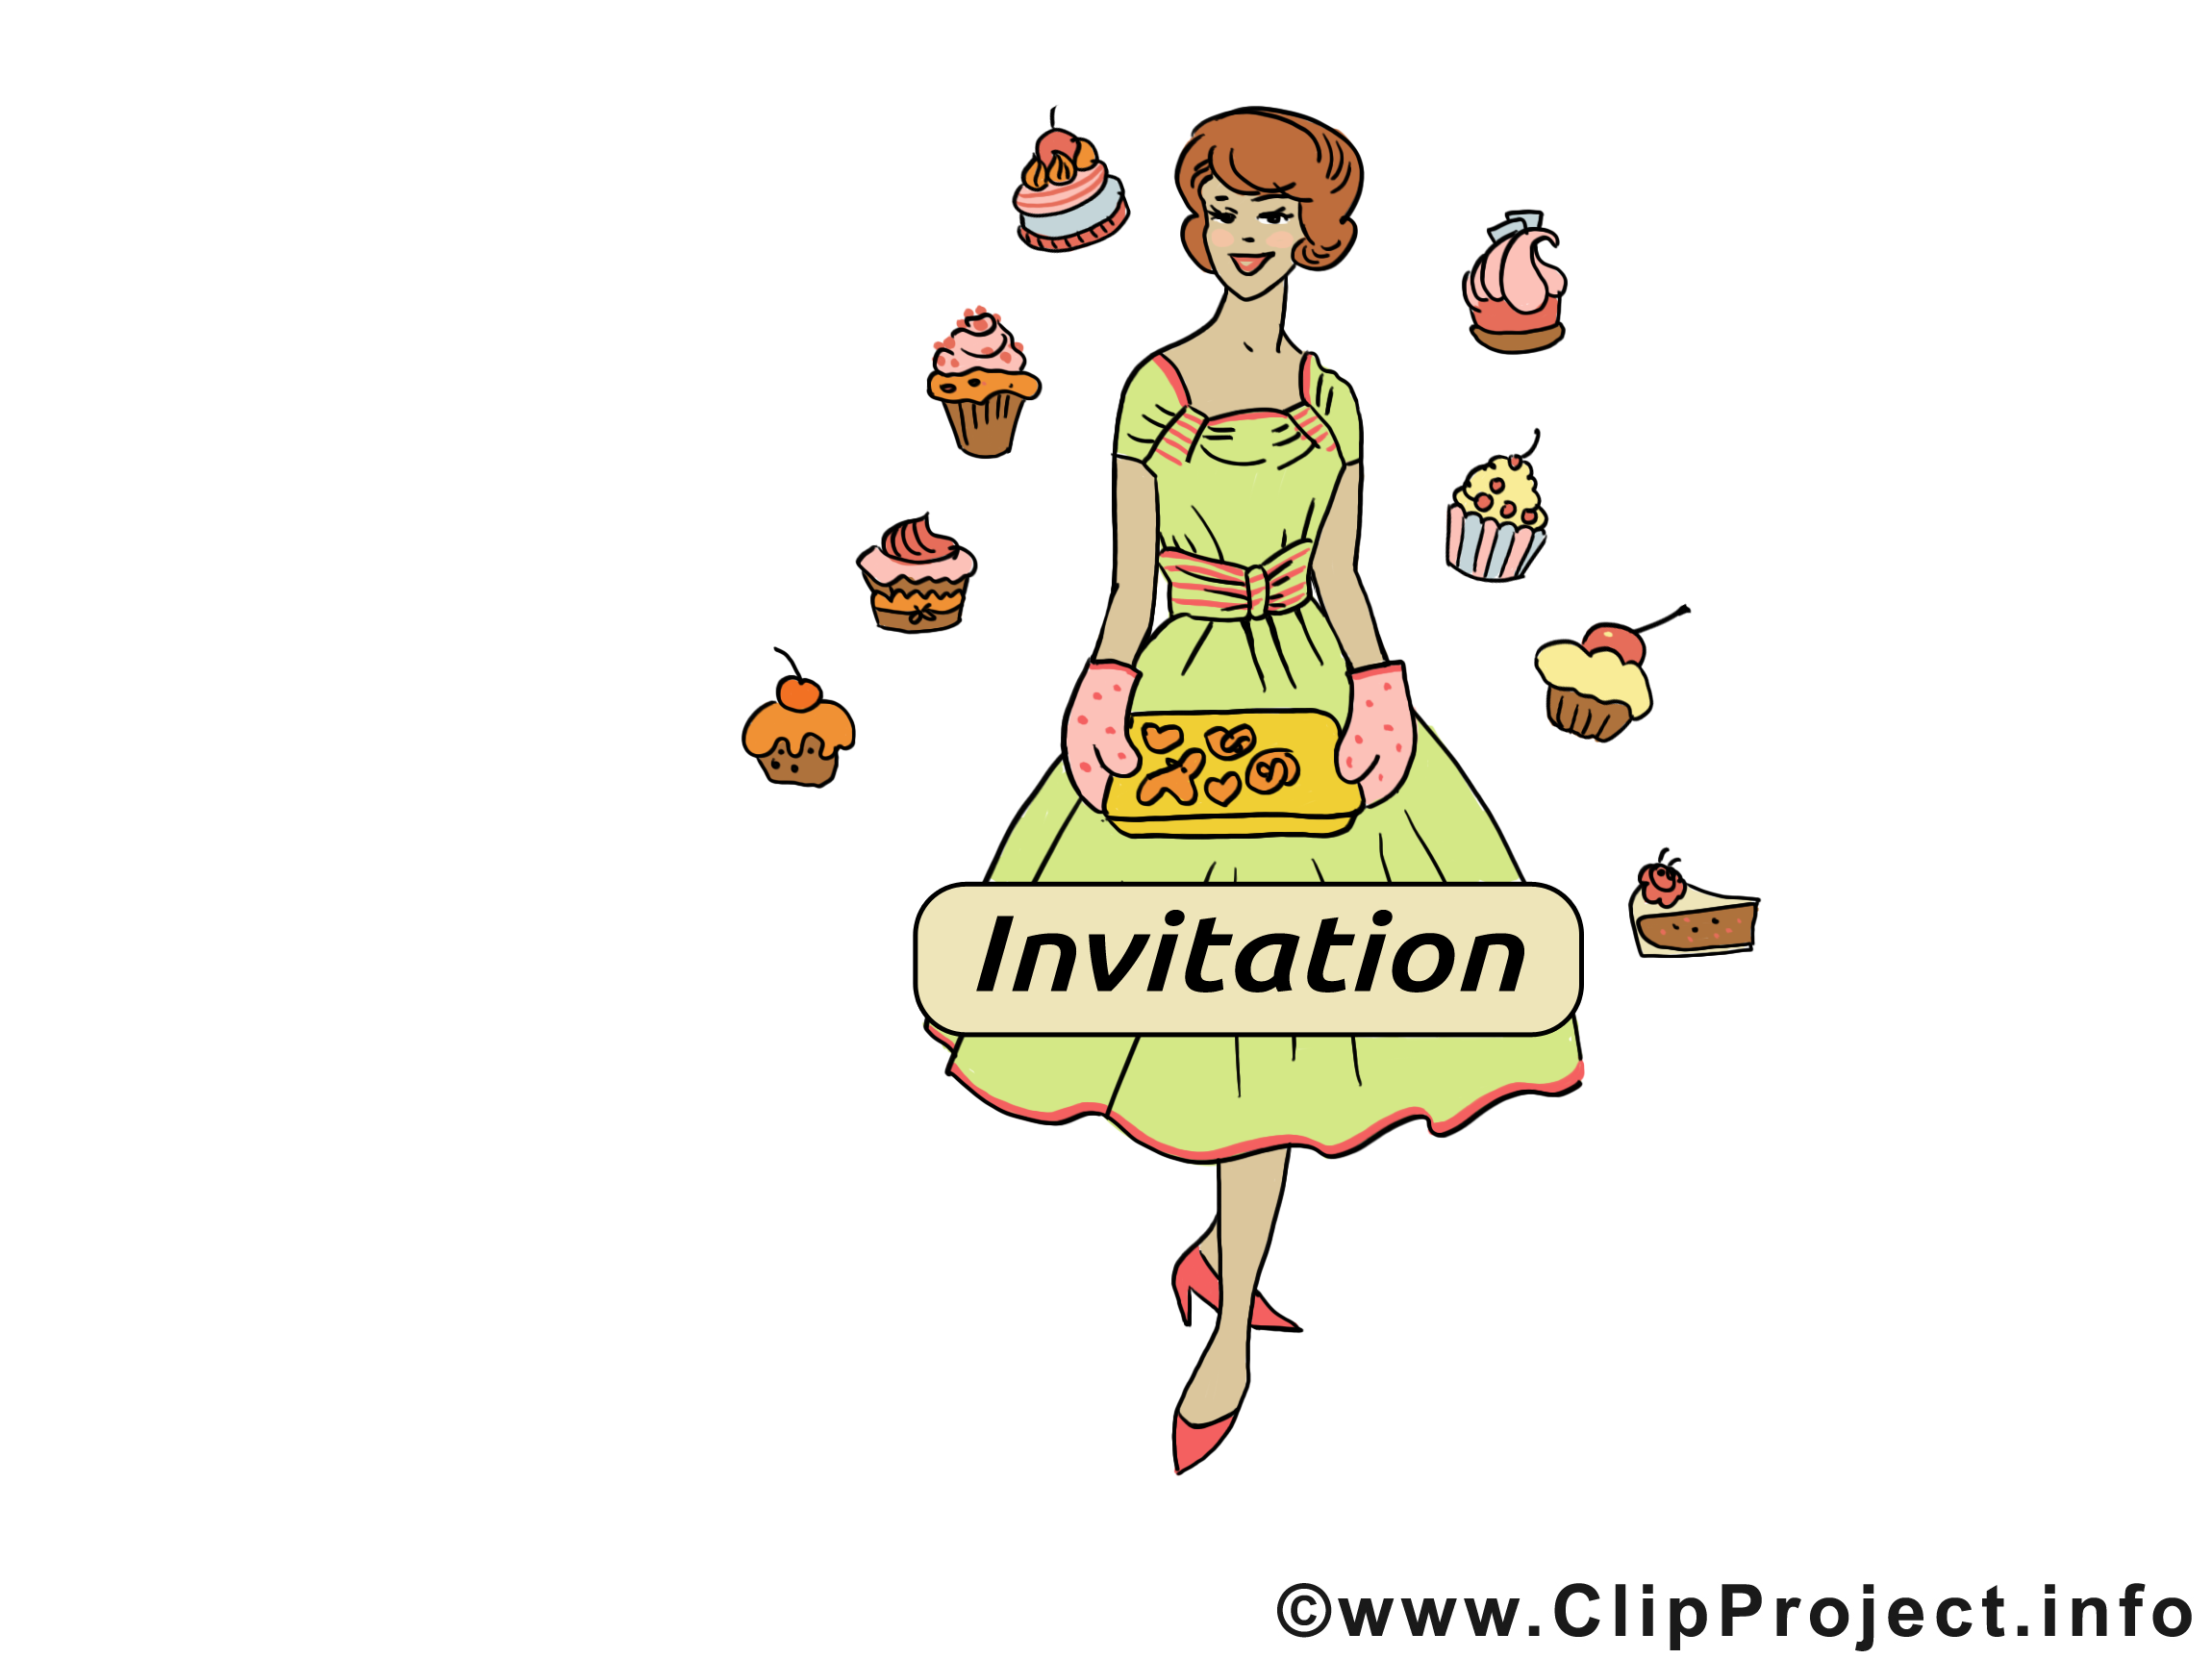 Pâtisserie clip arts gratuits - Invitation illustrations